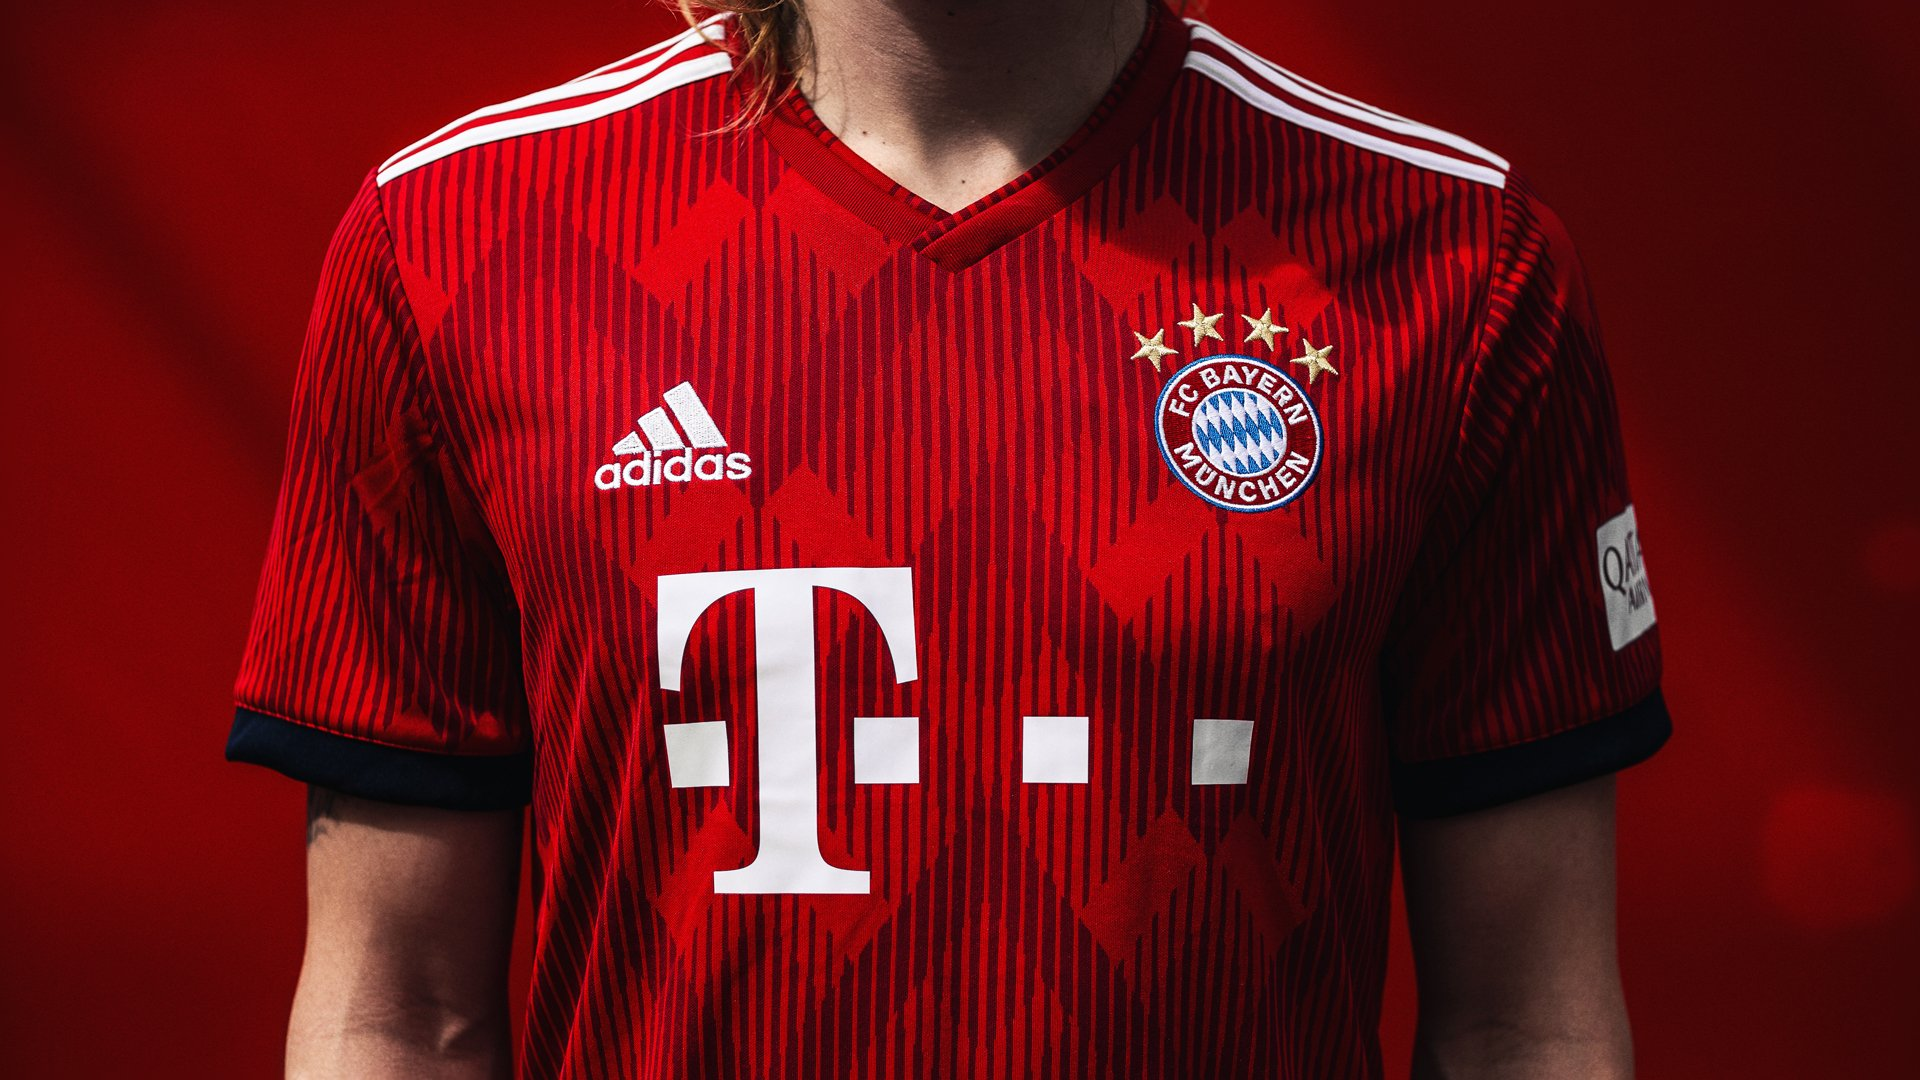 Maillot adidas du Bayern Munich pour la saison 2018-2019